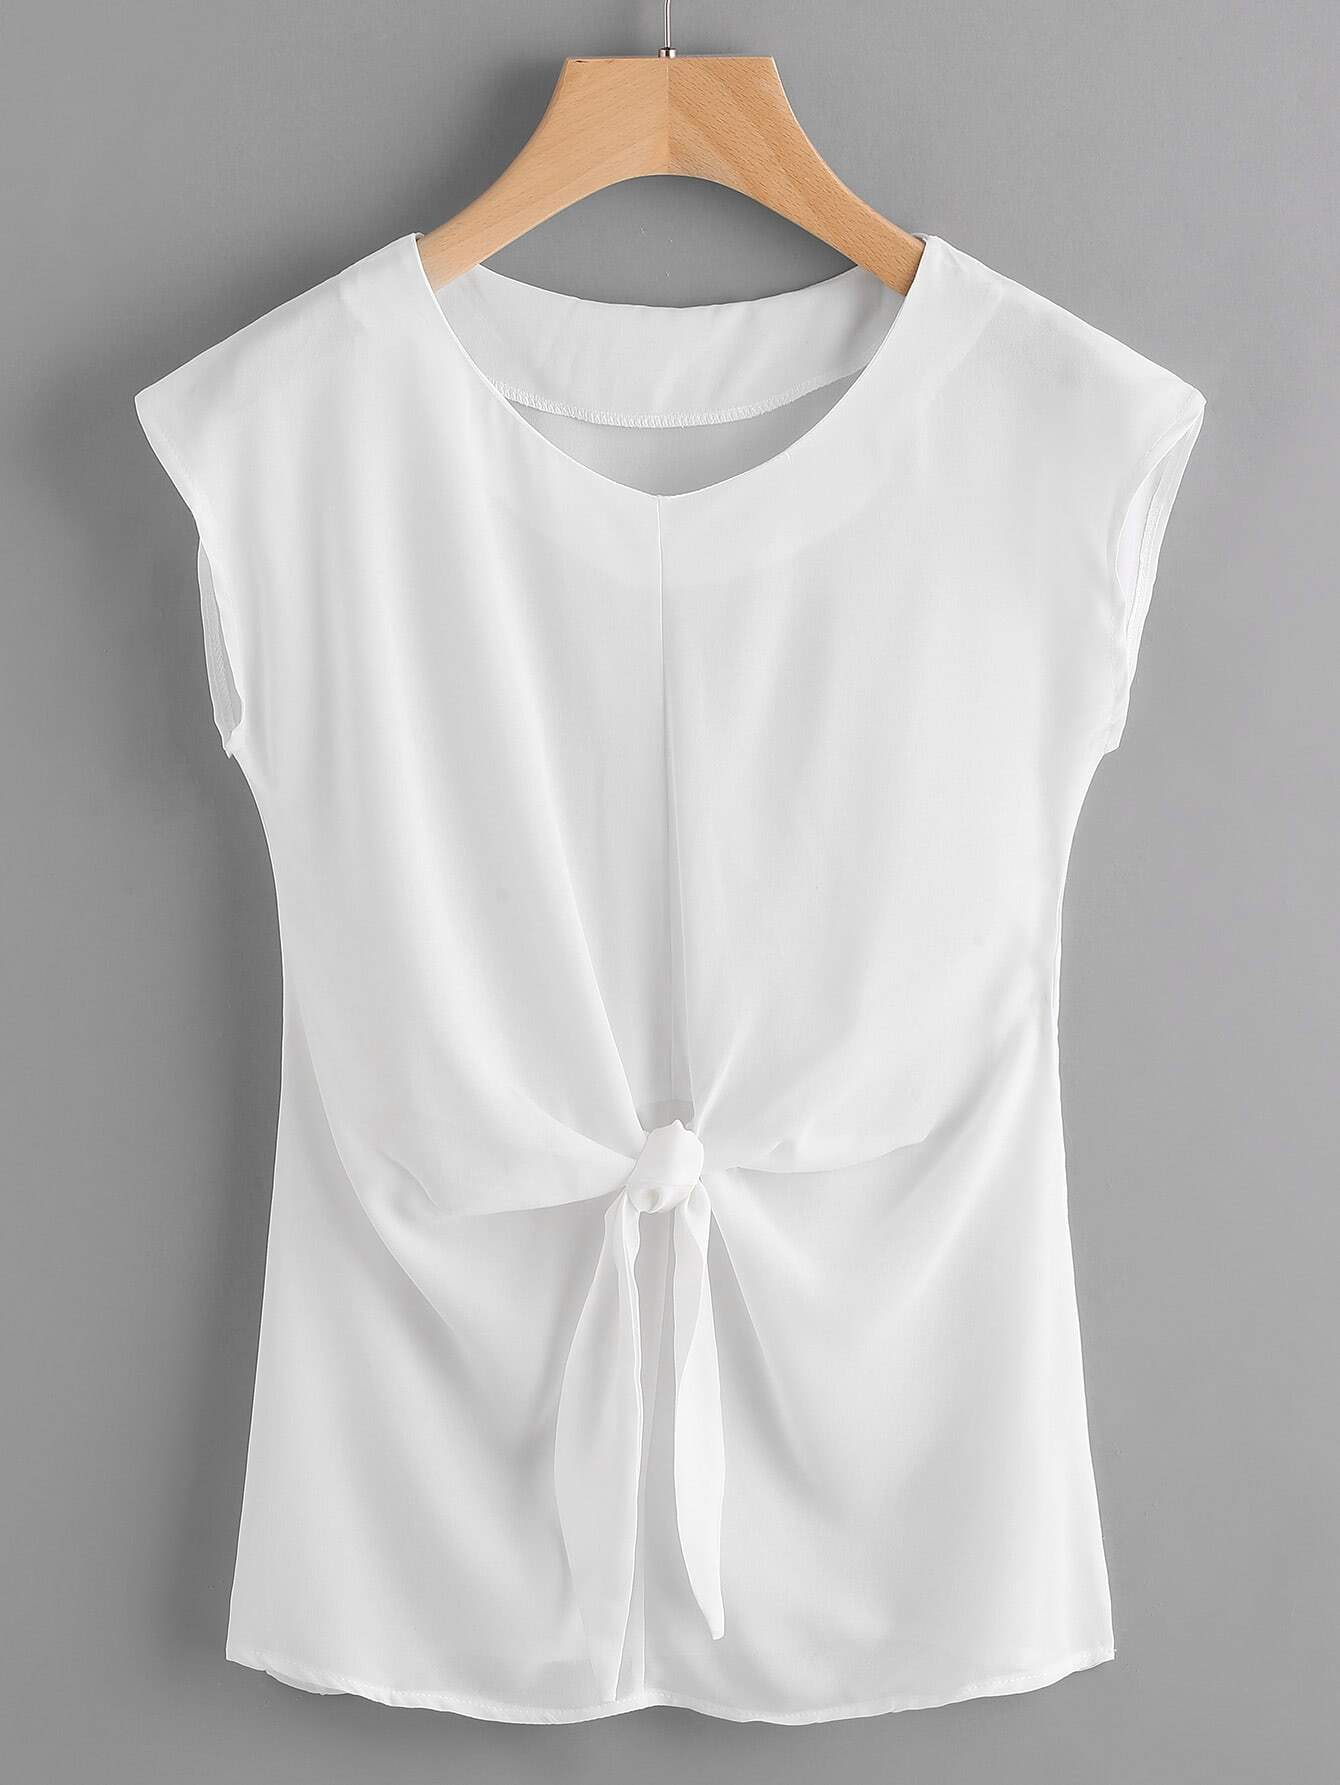 blouse170413101_2